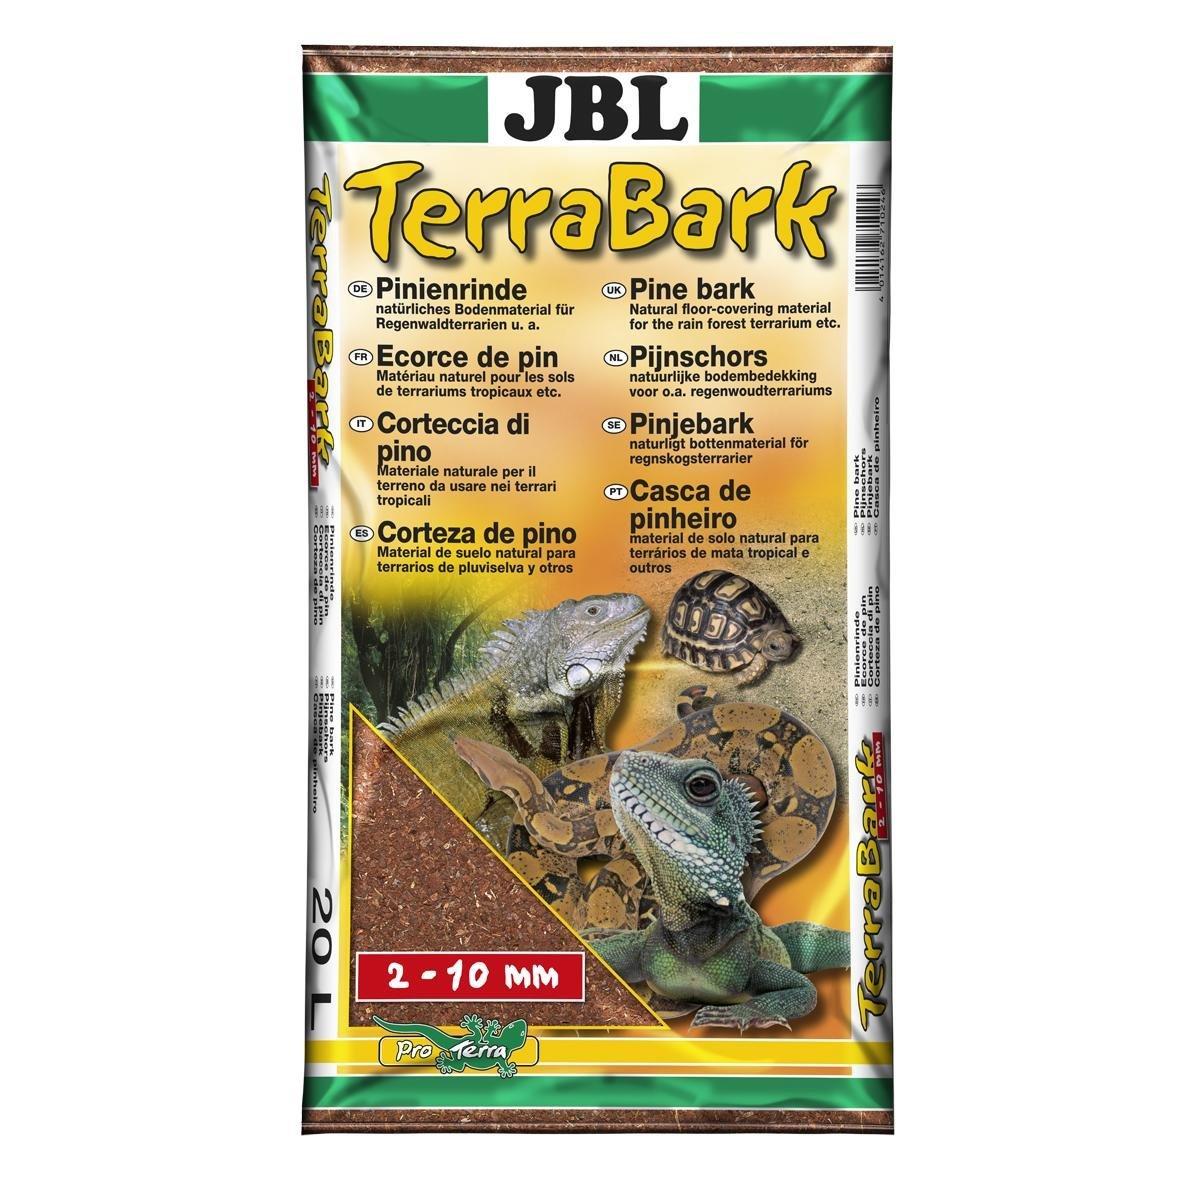 JBL Sustrato de suelo para terrarios de bosque y selva tropical, corteza de pino, TerraBark 7102000